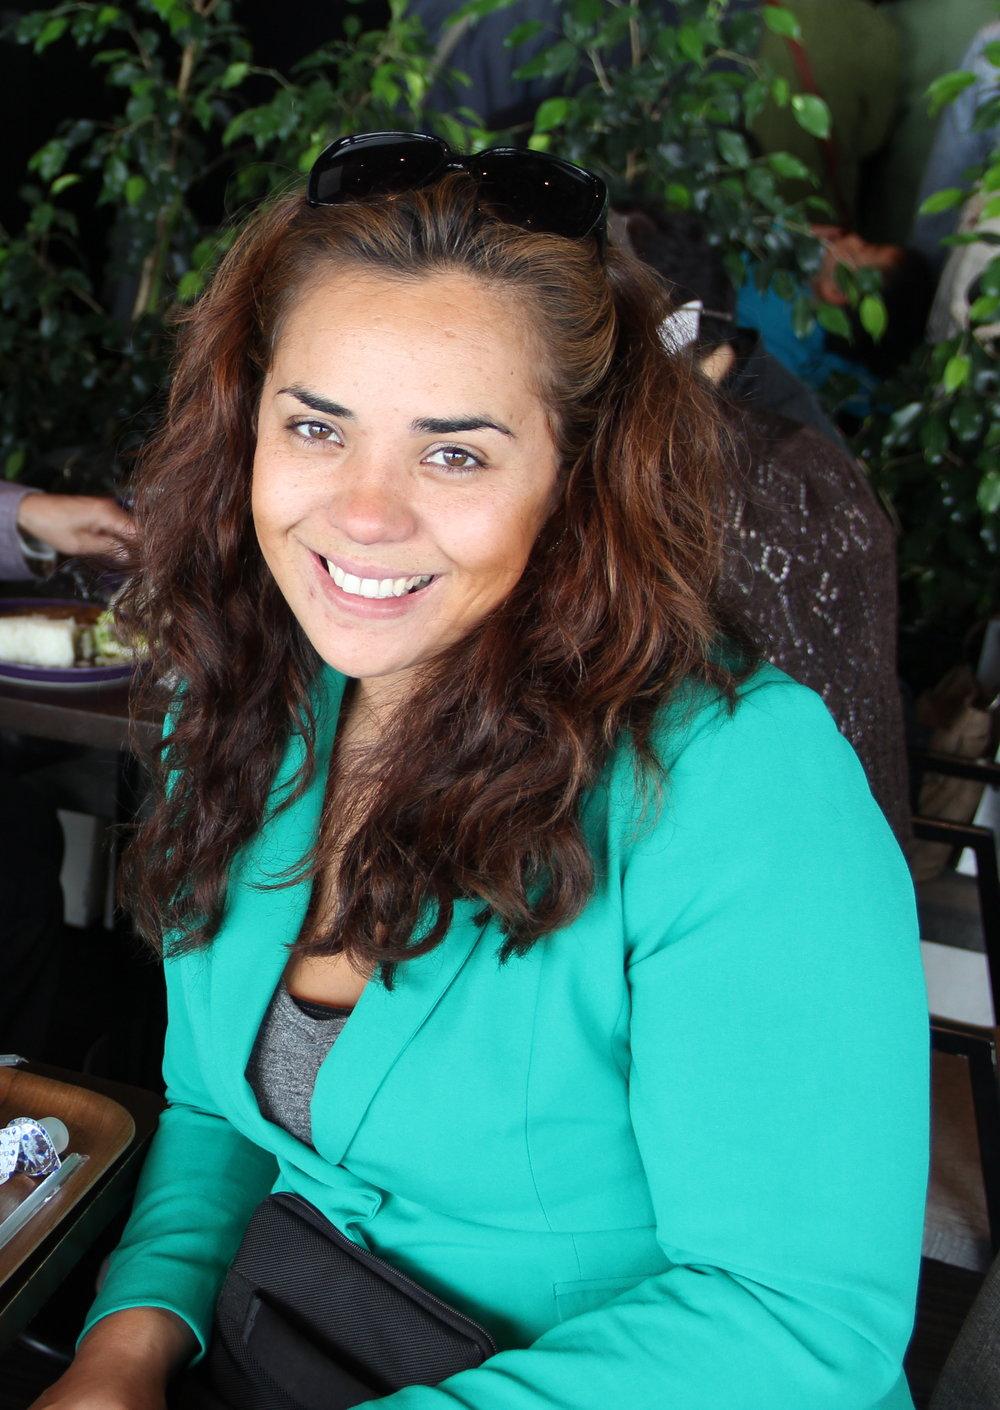 Ana Mapusua, DUNedin YWCA manager